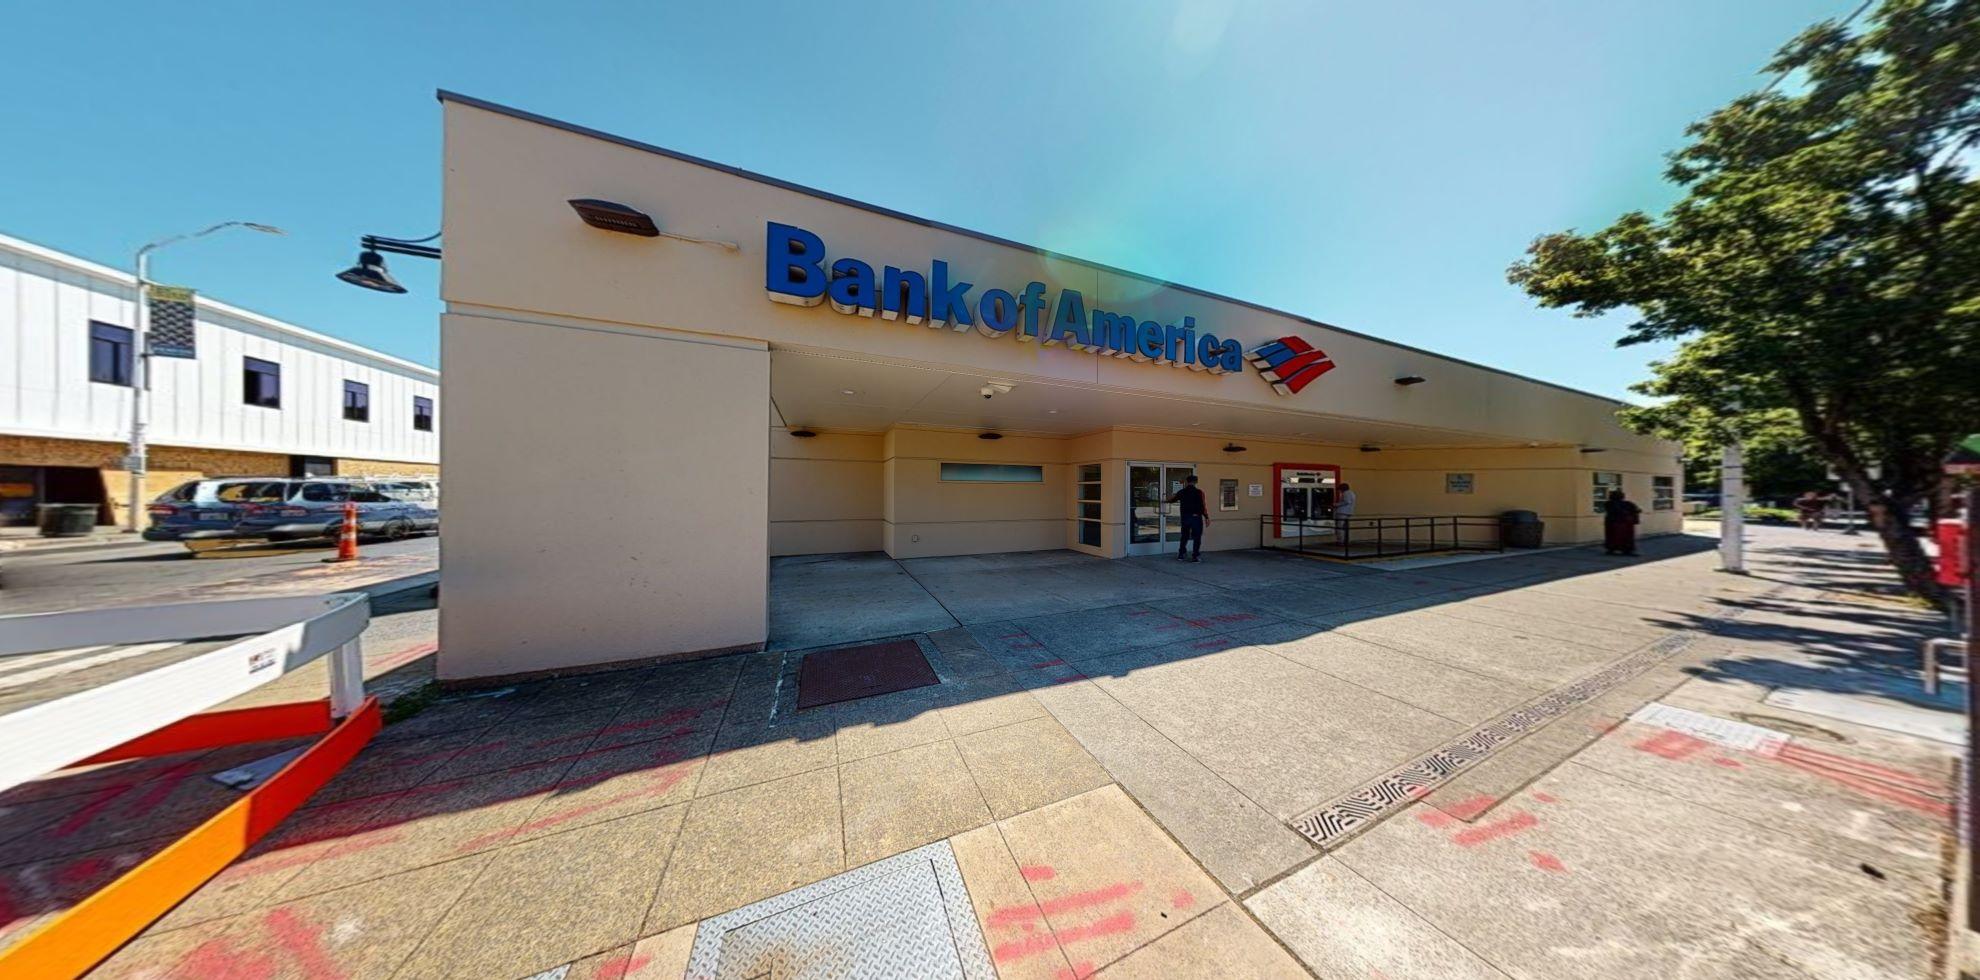 Bank of America financial center with walk-up ATM   300 Burnett Ave S, Renton, WA 98057